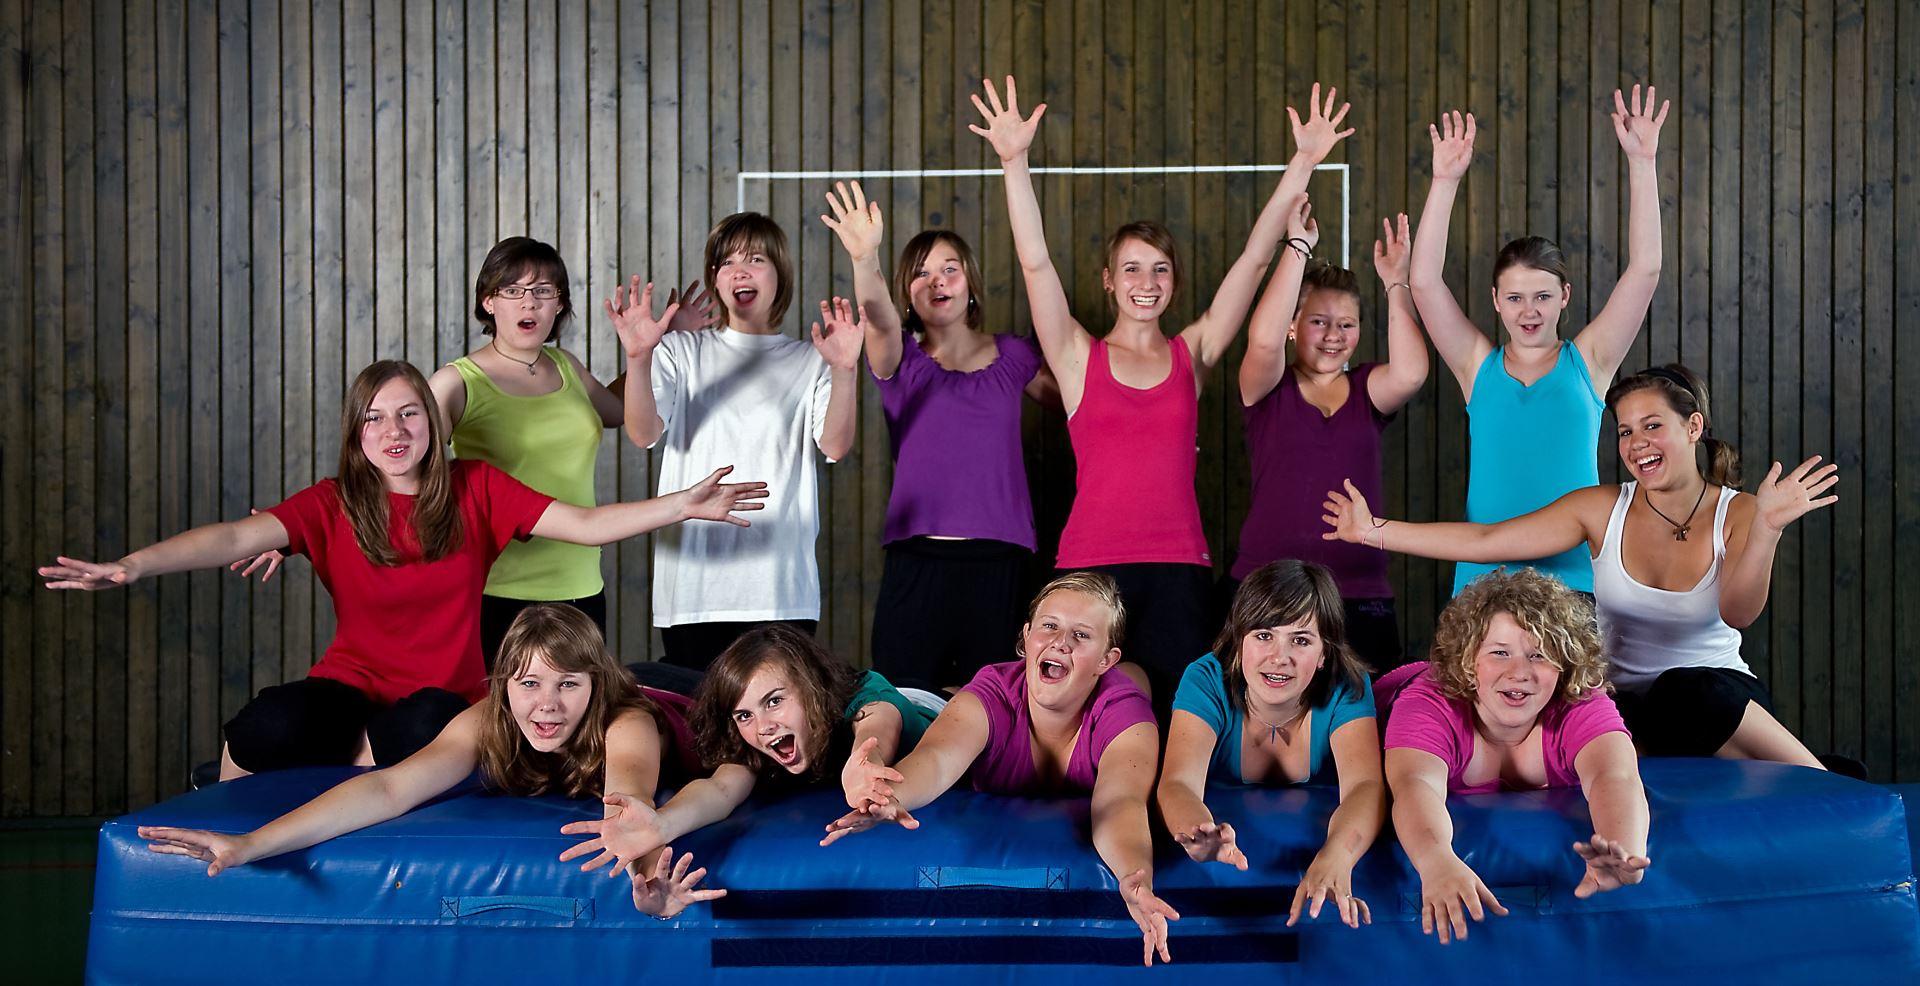 Jugendturnen (Gruppe 1) im Jahr 2010 (04)